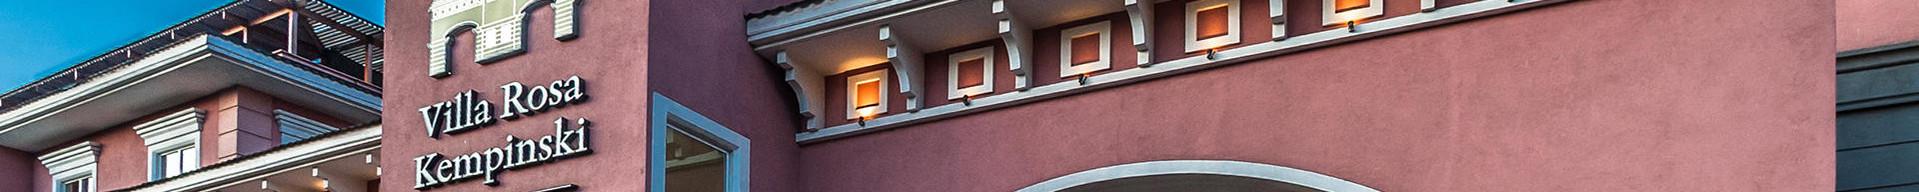 VillaRosaKempinski_Exterior01_banner_ima